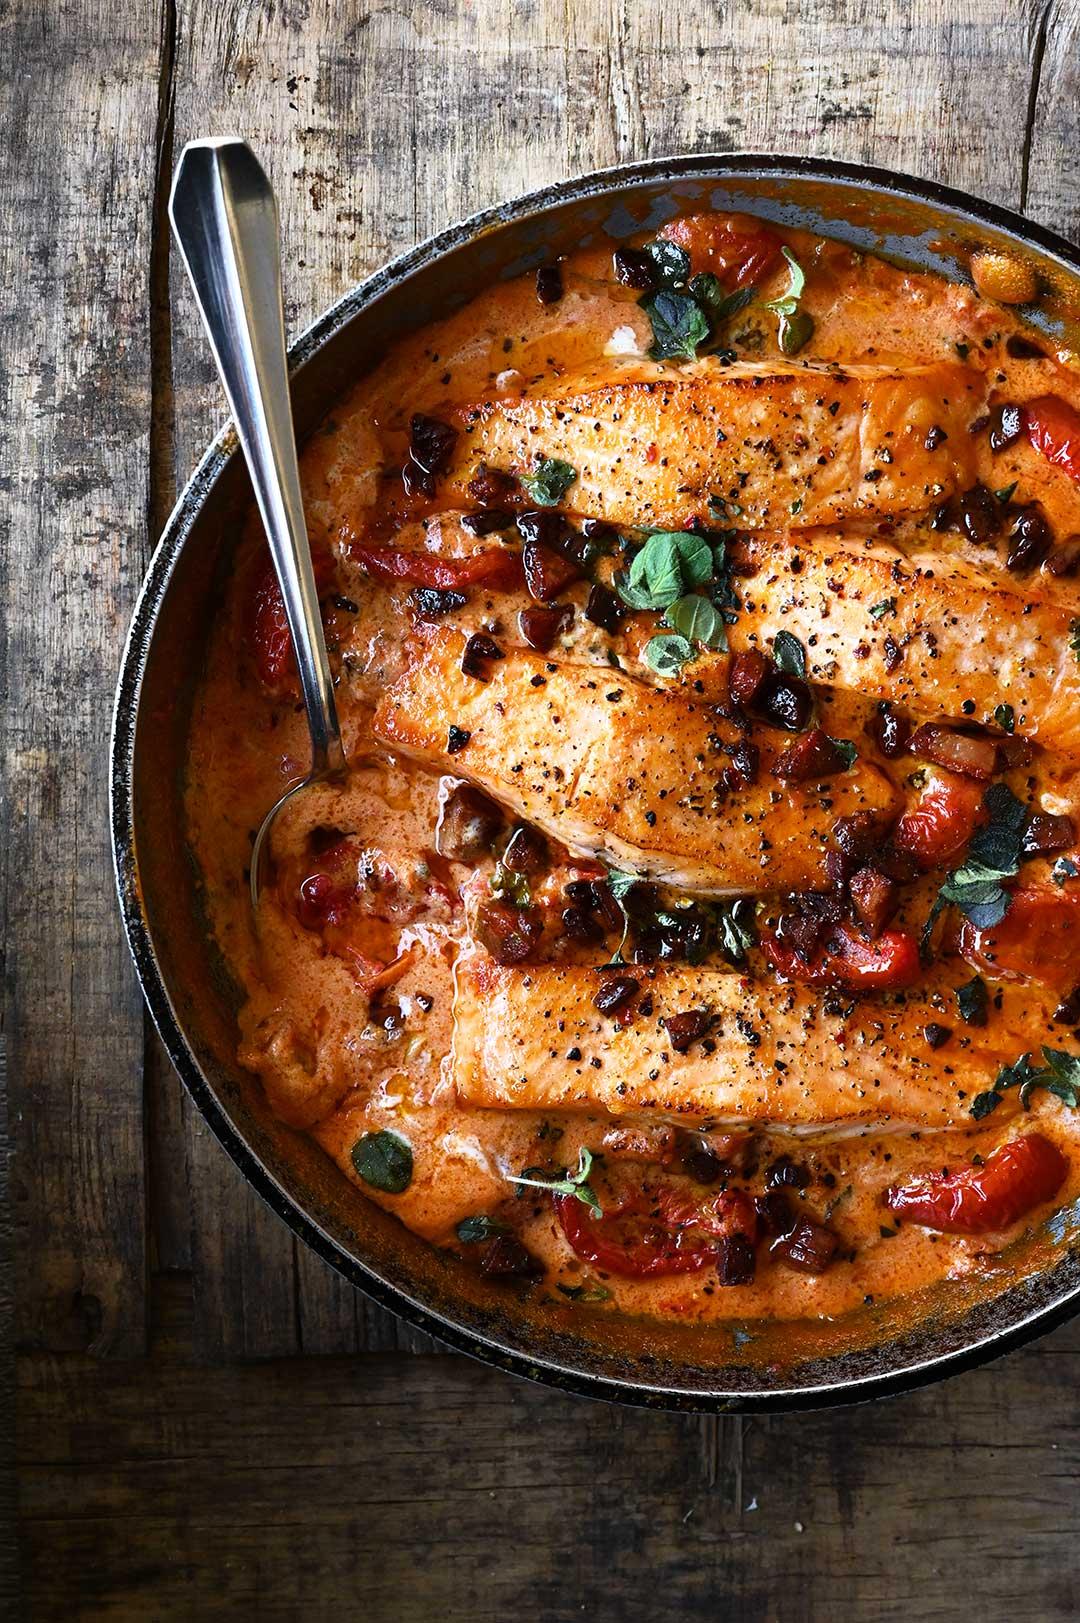 serving dumplings   One-Pan Creamy Tomato Salmon with Chorizo